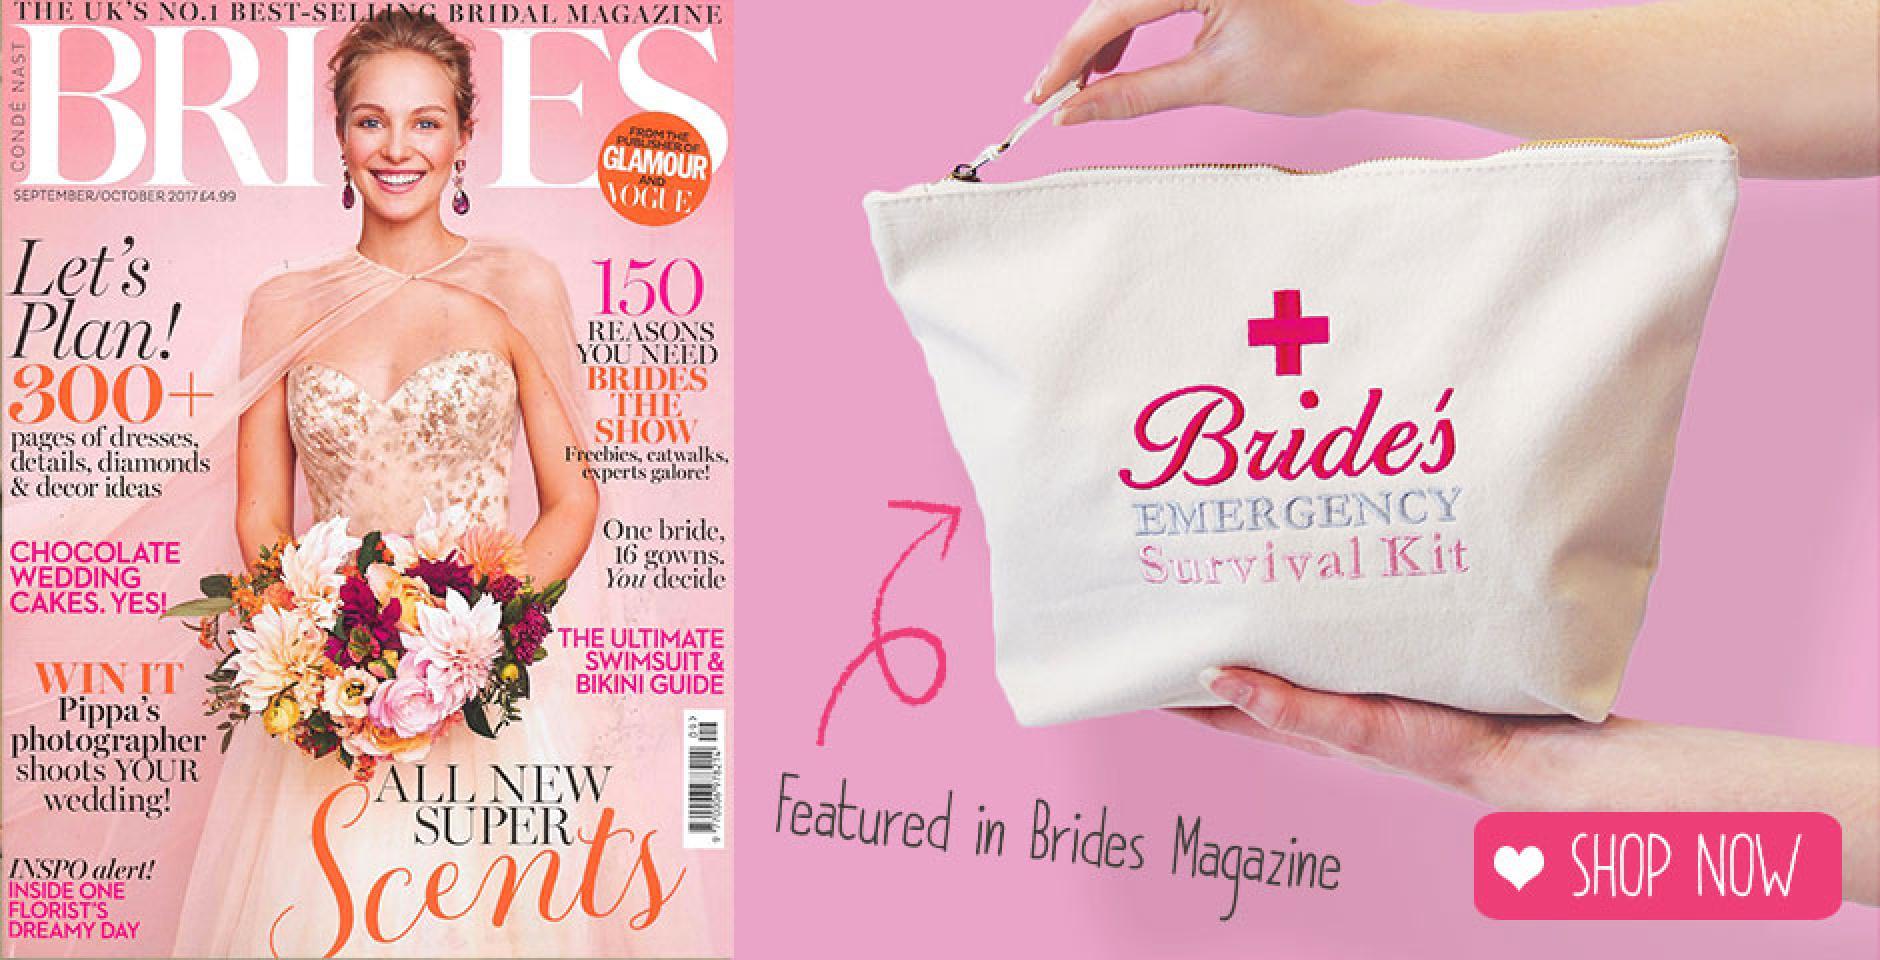 Brides Survival Bag Featured in Brides Magazine